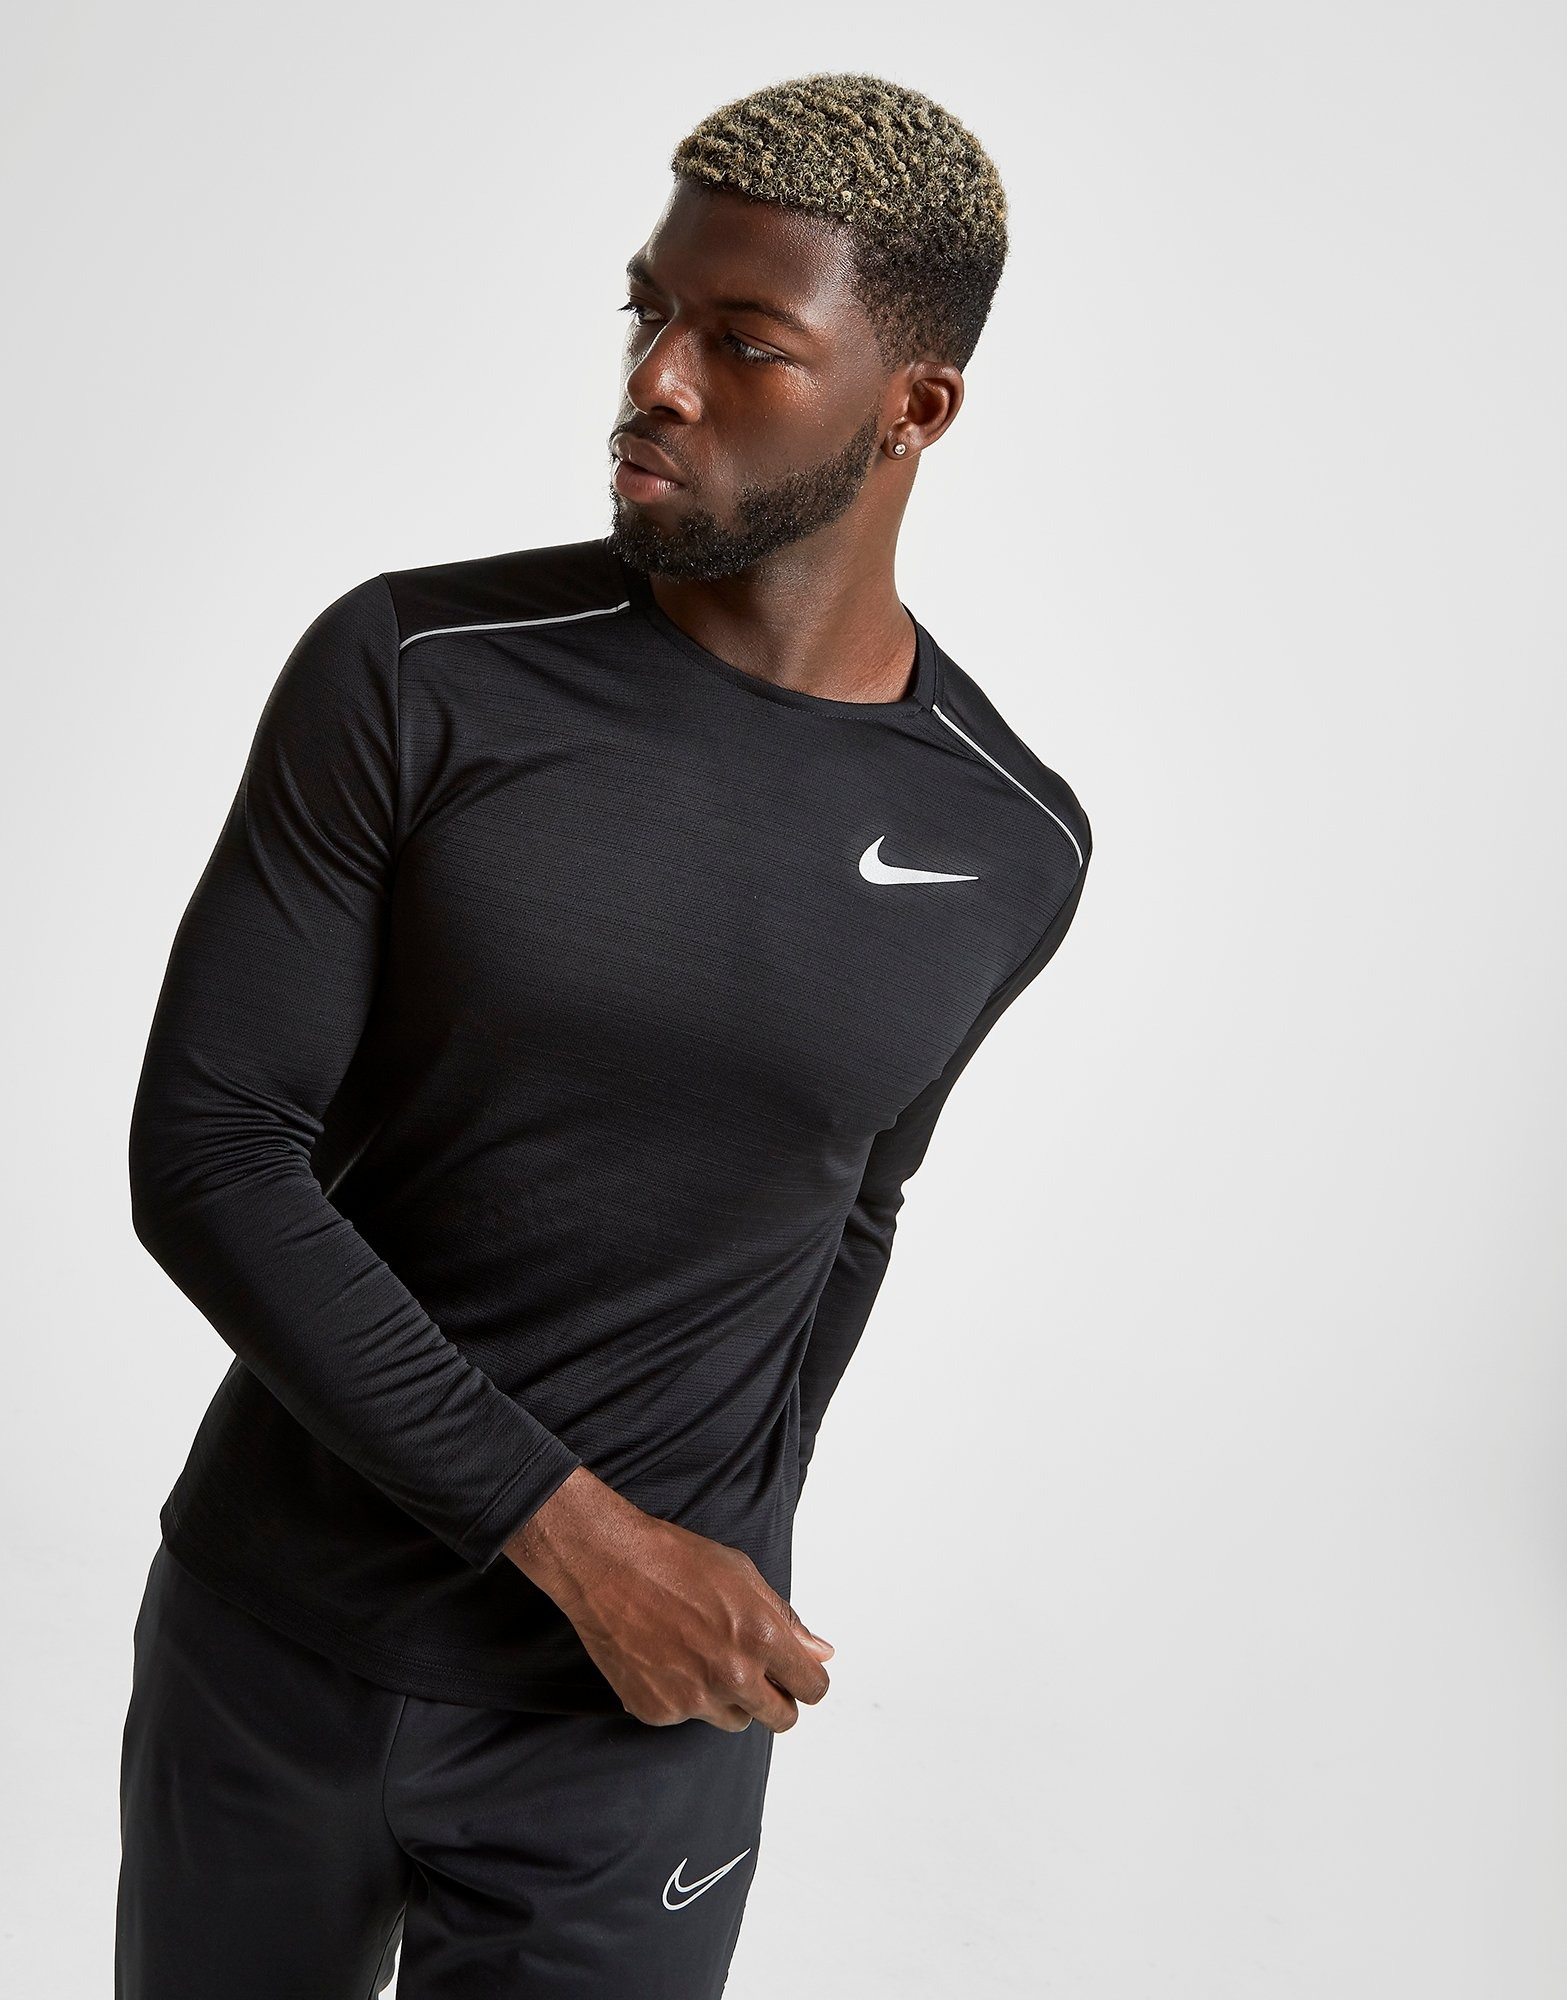 Nike camiseta de manga larga Dri FIT Miler | JD Sports